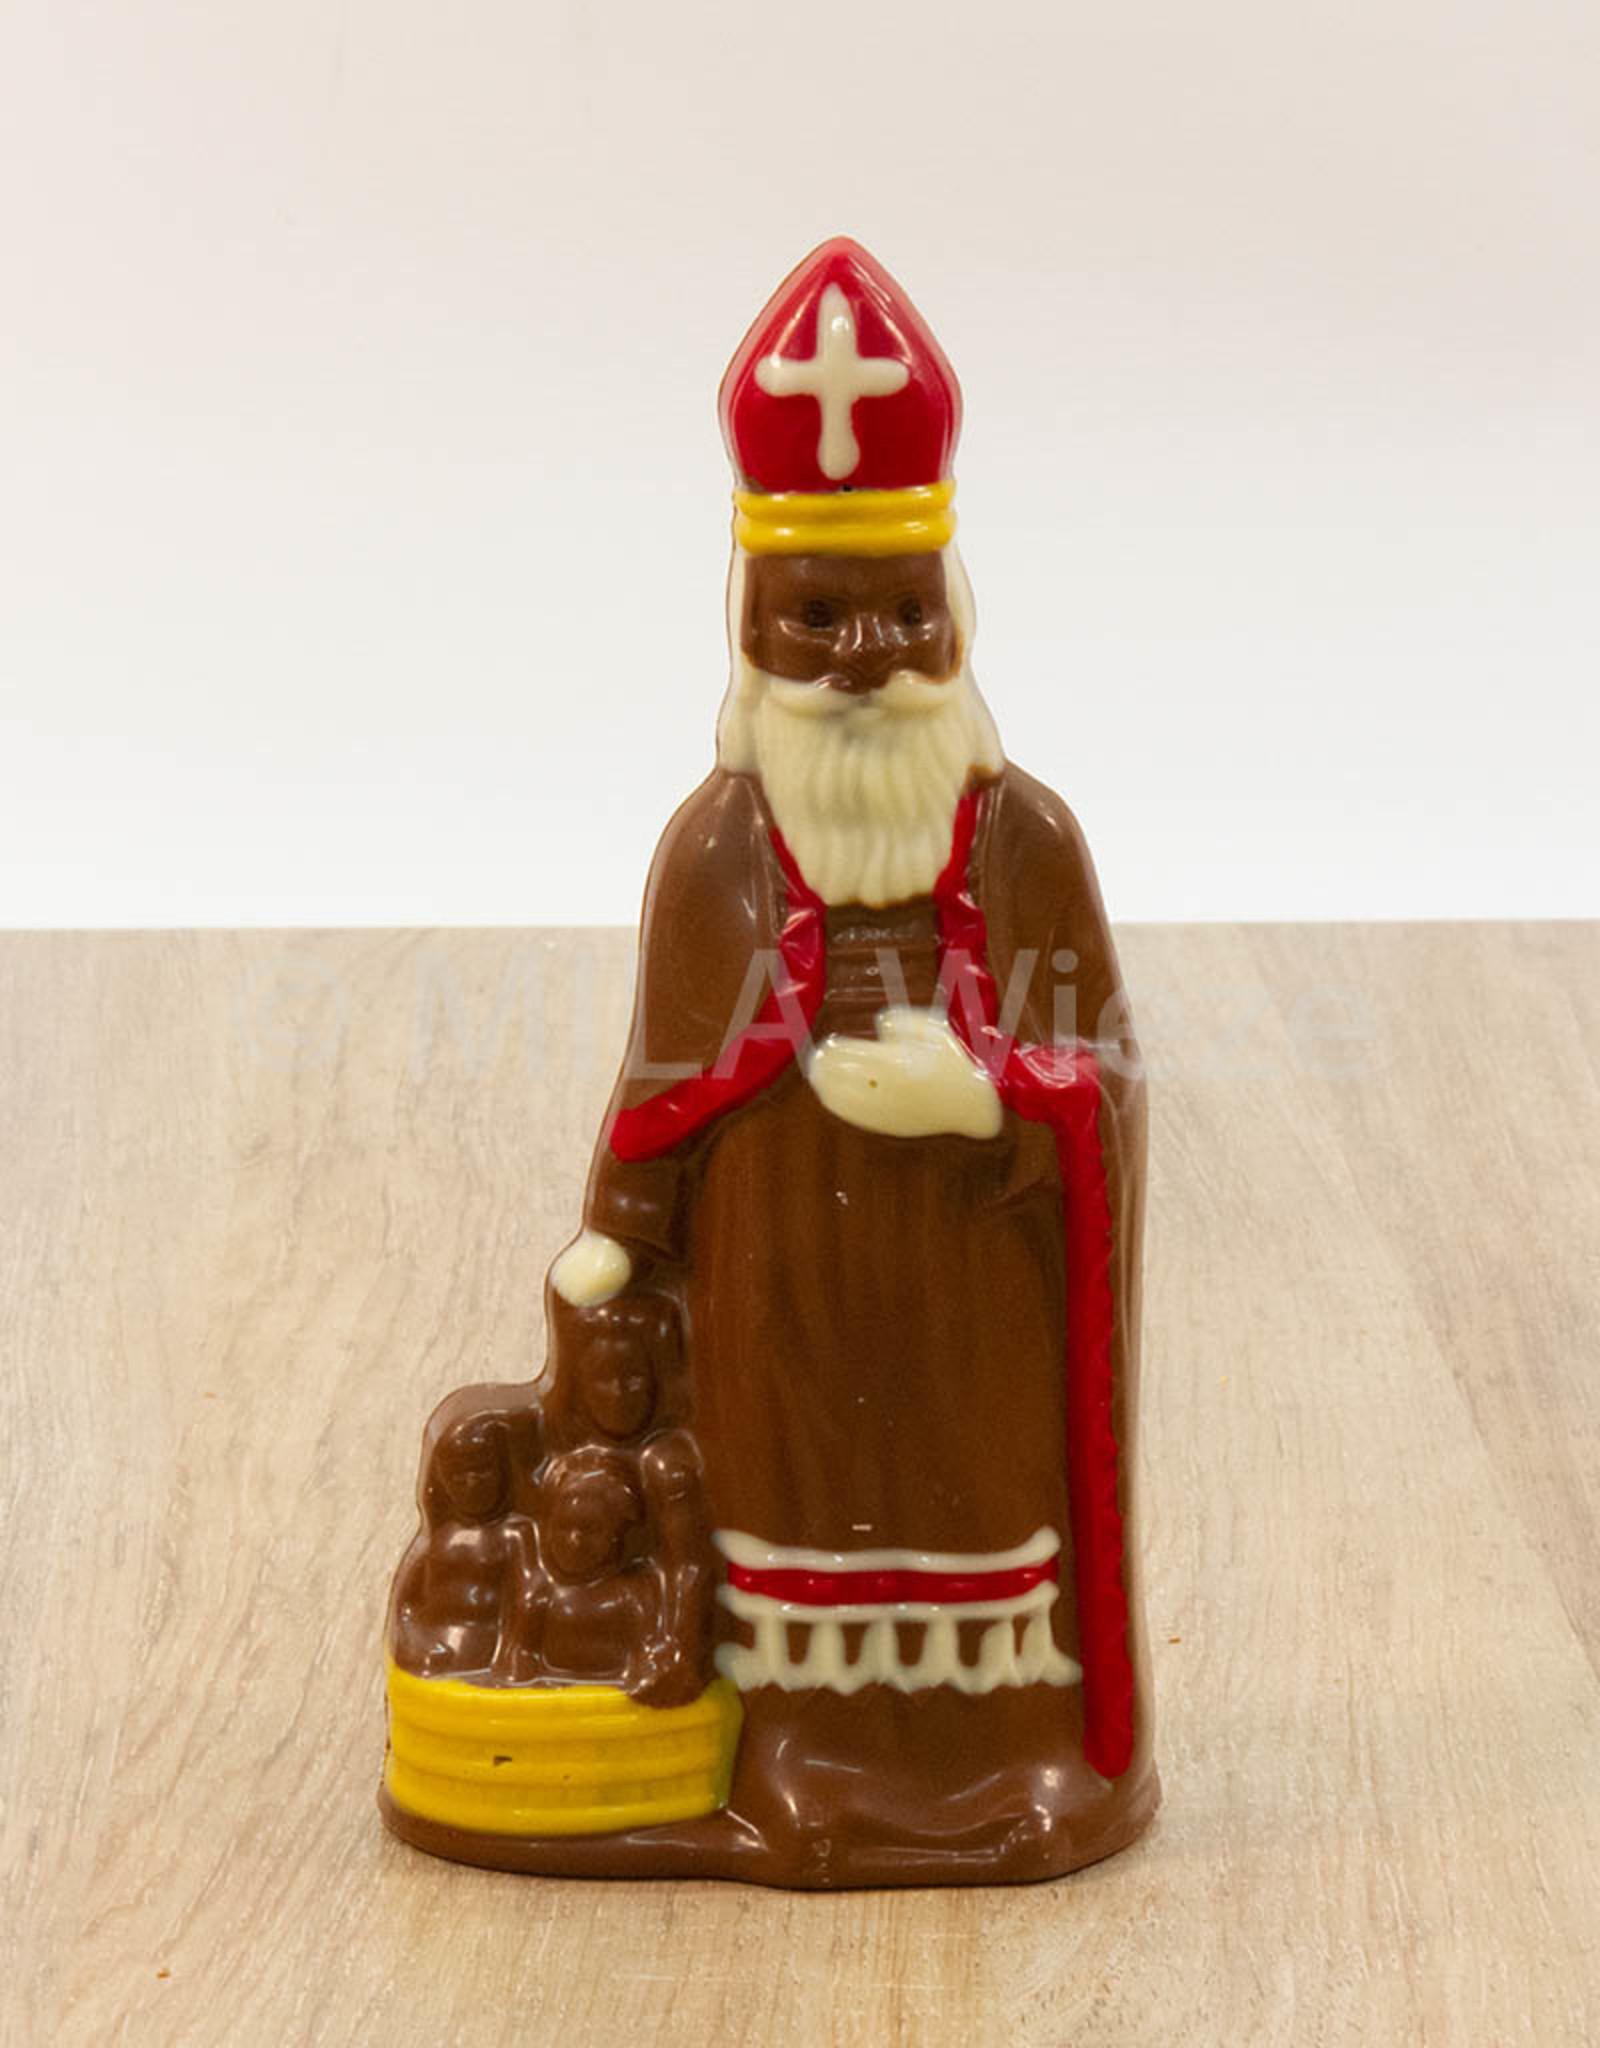 Sint deco - 125 gr - 20 cm -melkchocolade en fondant chocolade